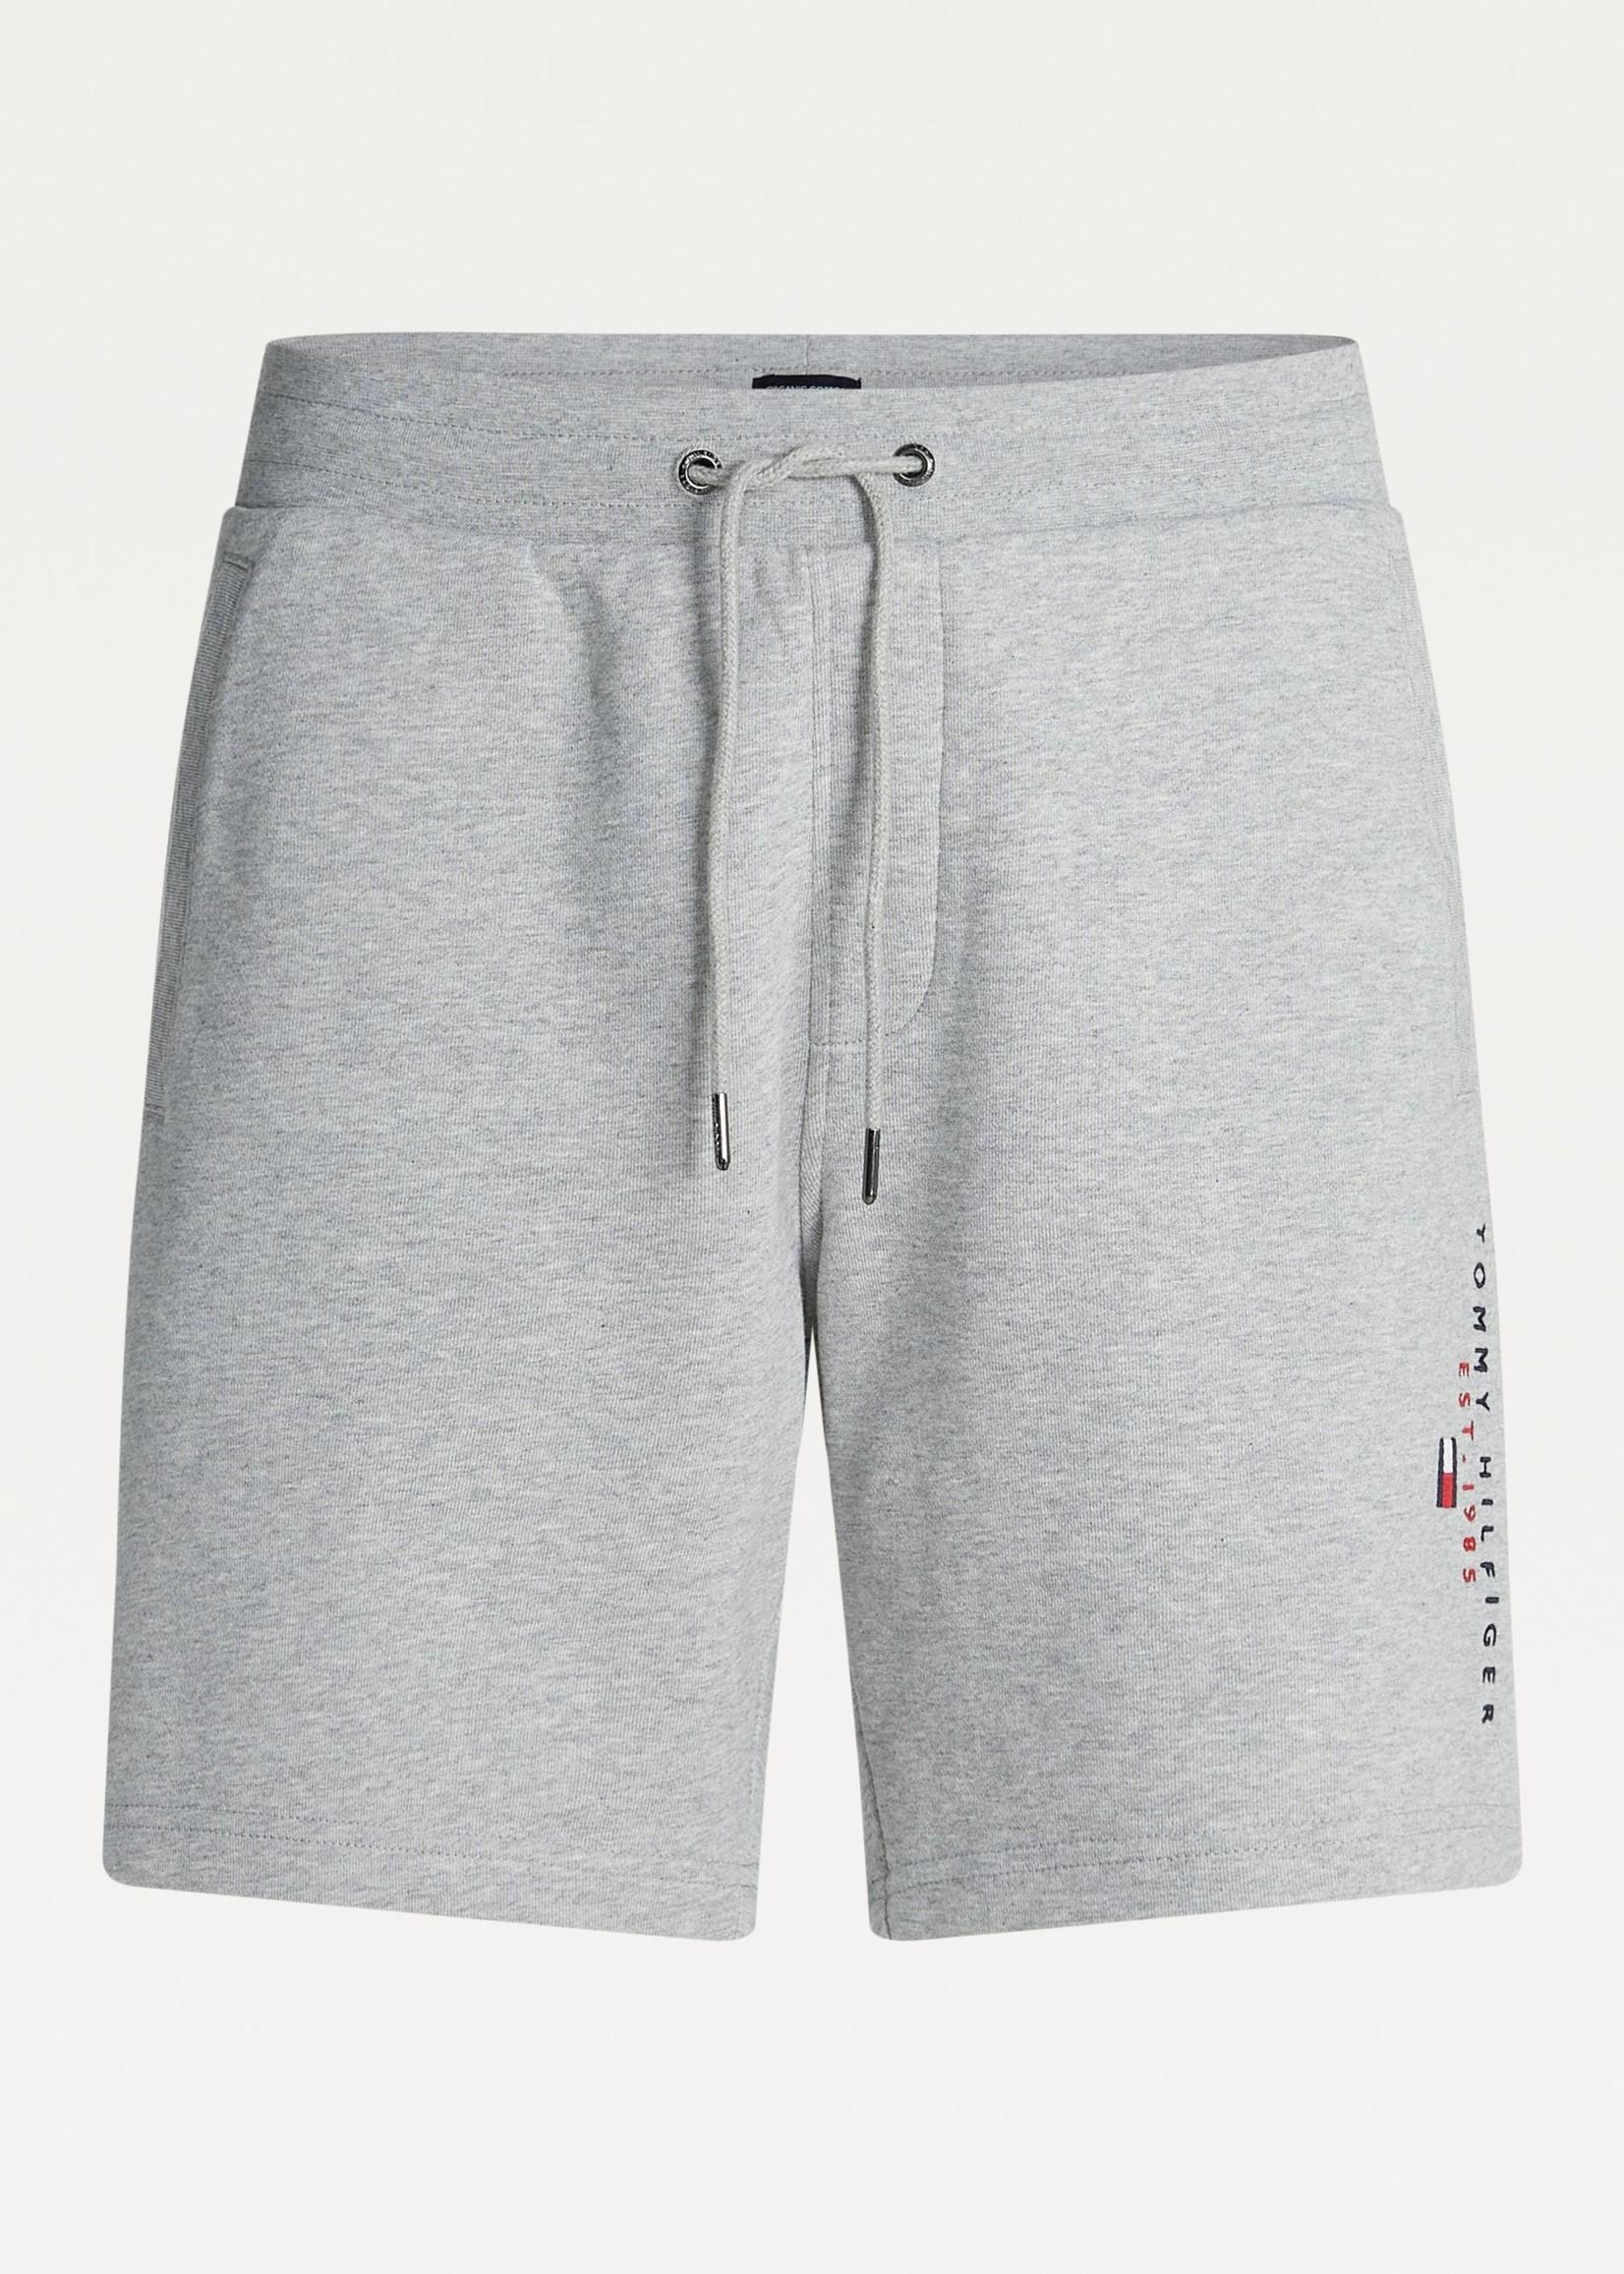 Tommy Hilfiger Short de jogging Essential en coton bio | Gris | Tommy Hilfiger